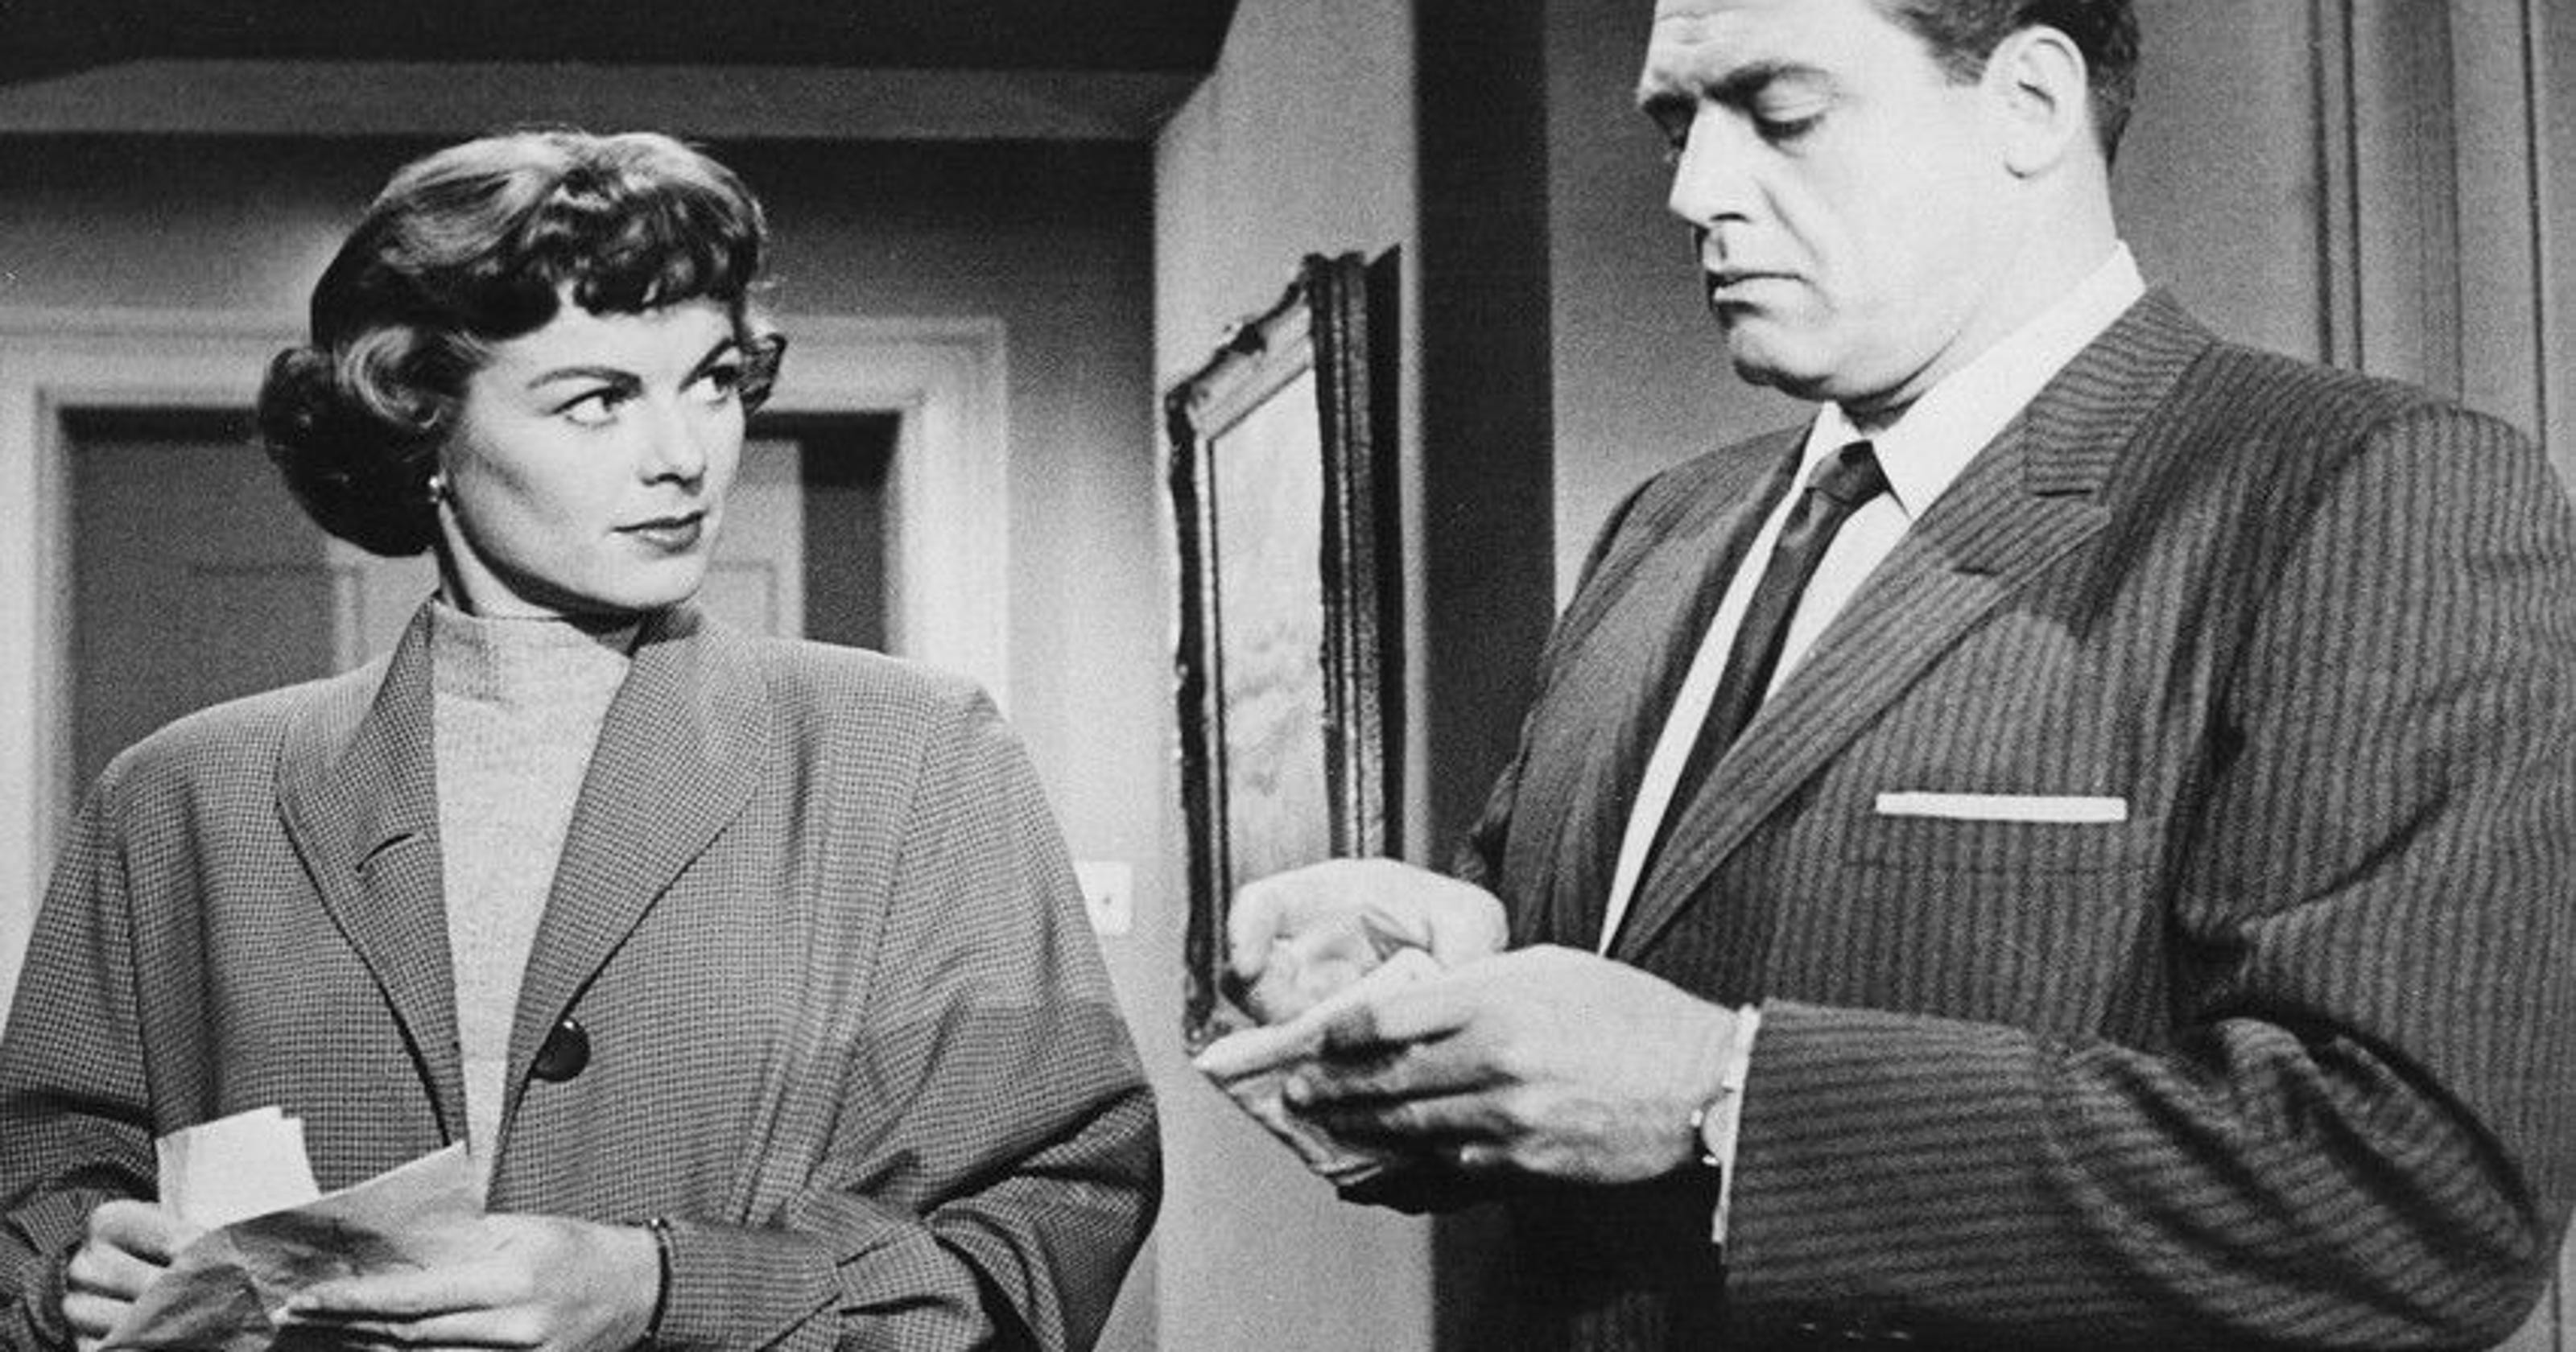 Barbara Hale, loyal Della Street on TV's 'Perry Mason,' dies